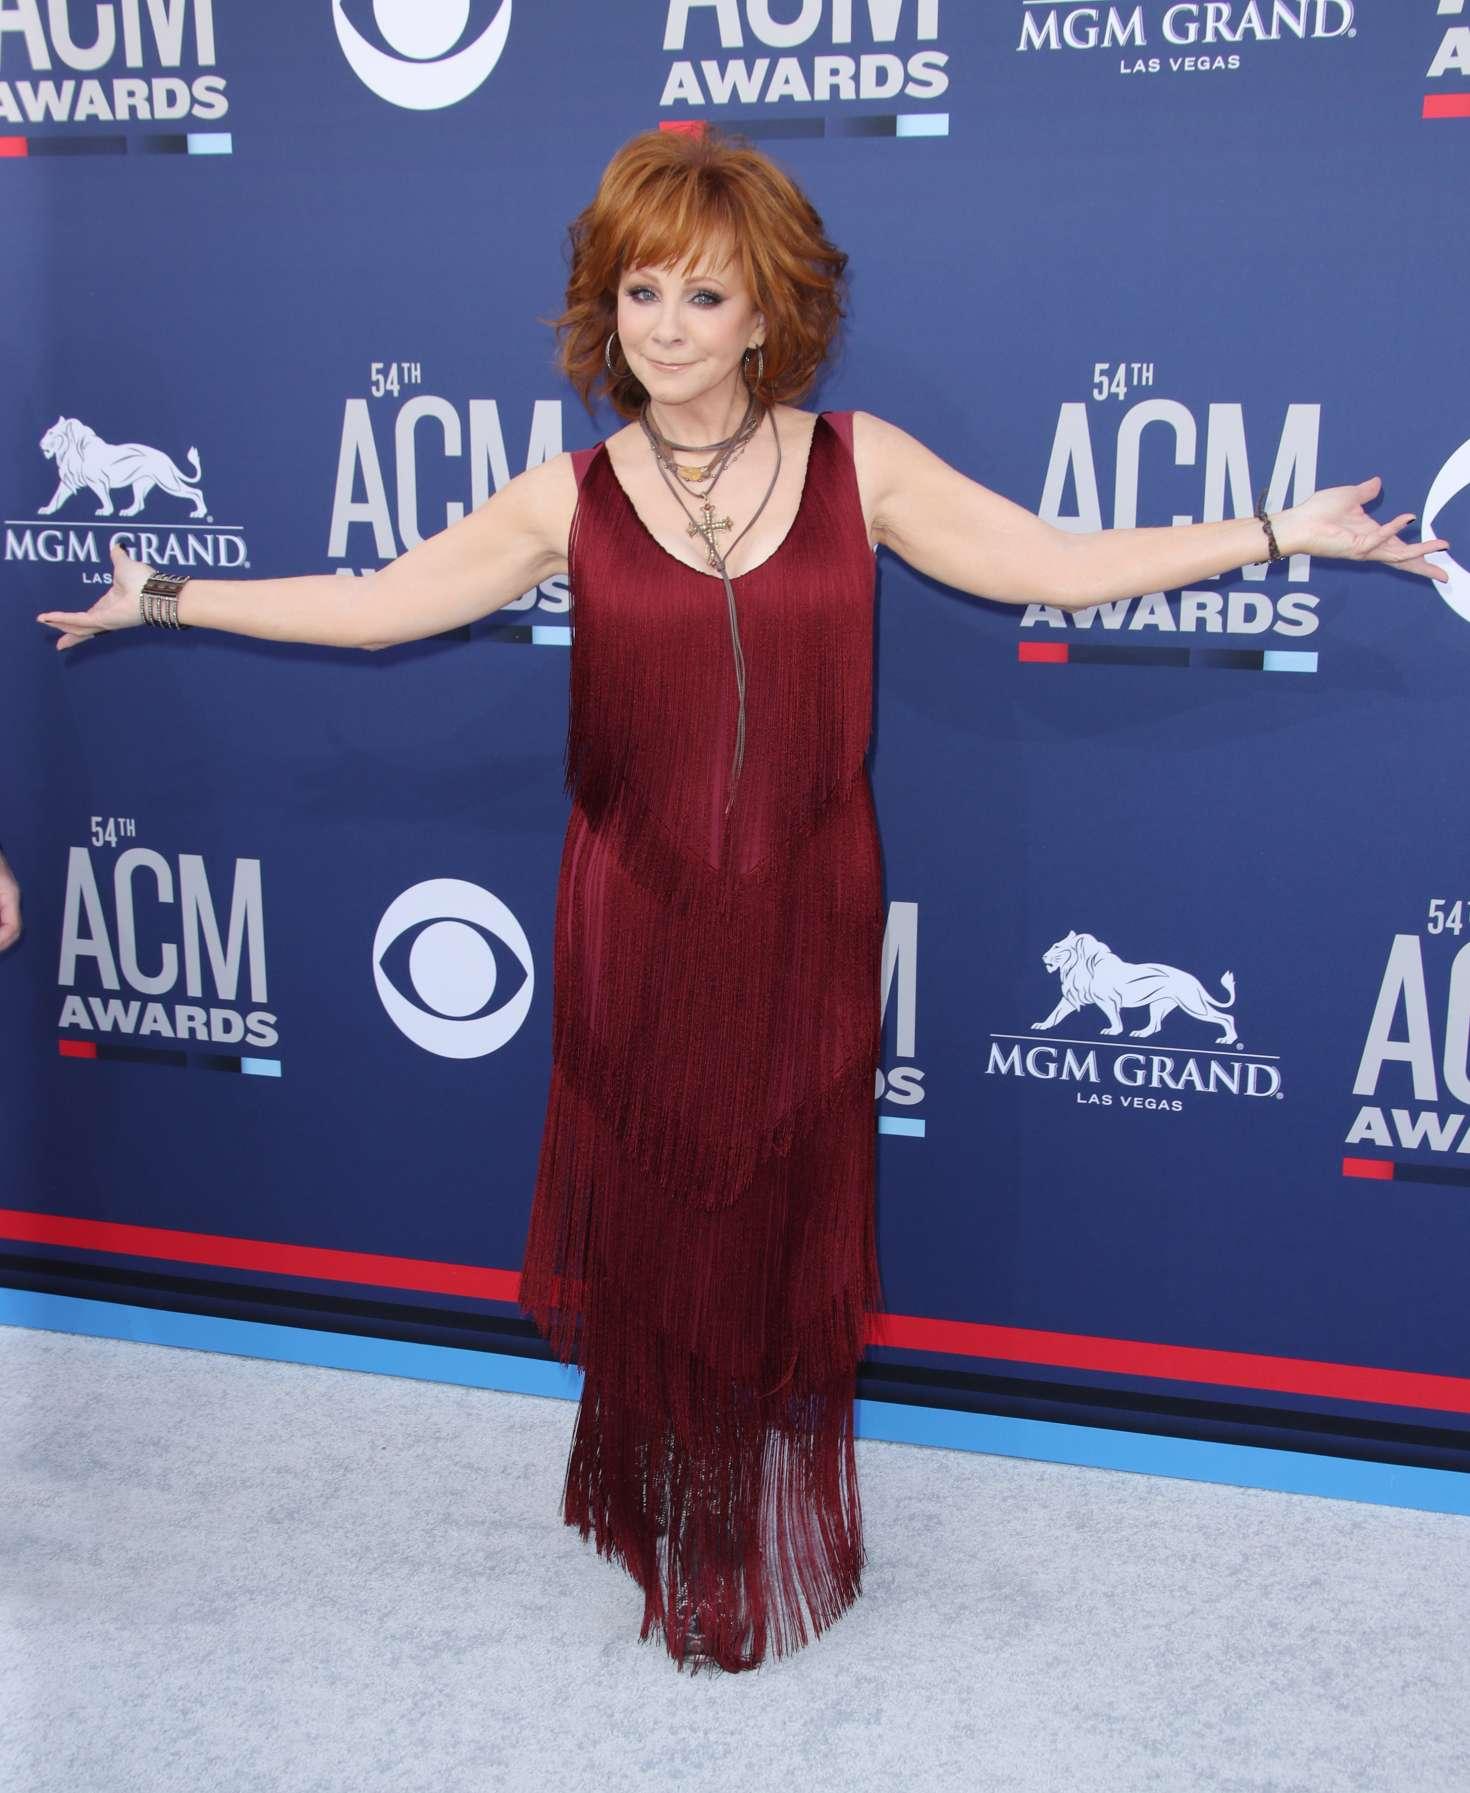 Reba Mcentire 2019 : Reba McEntire: 2019 Academy of Country Music Awards -04